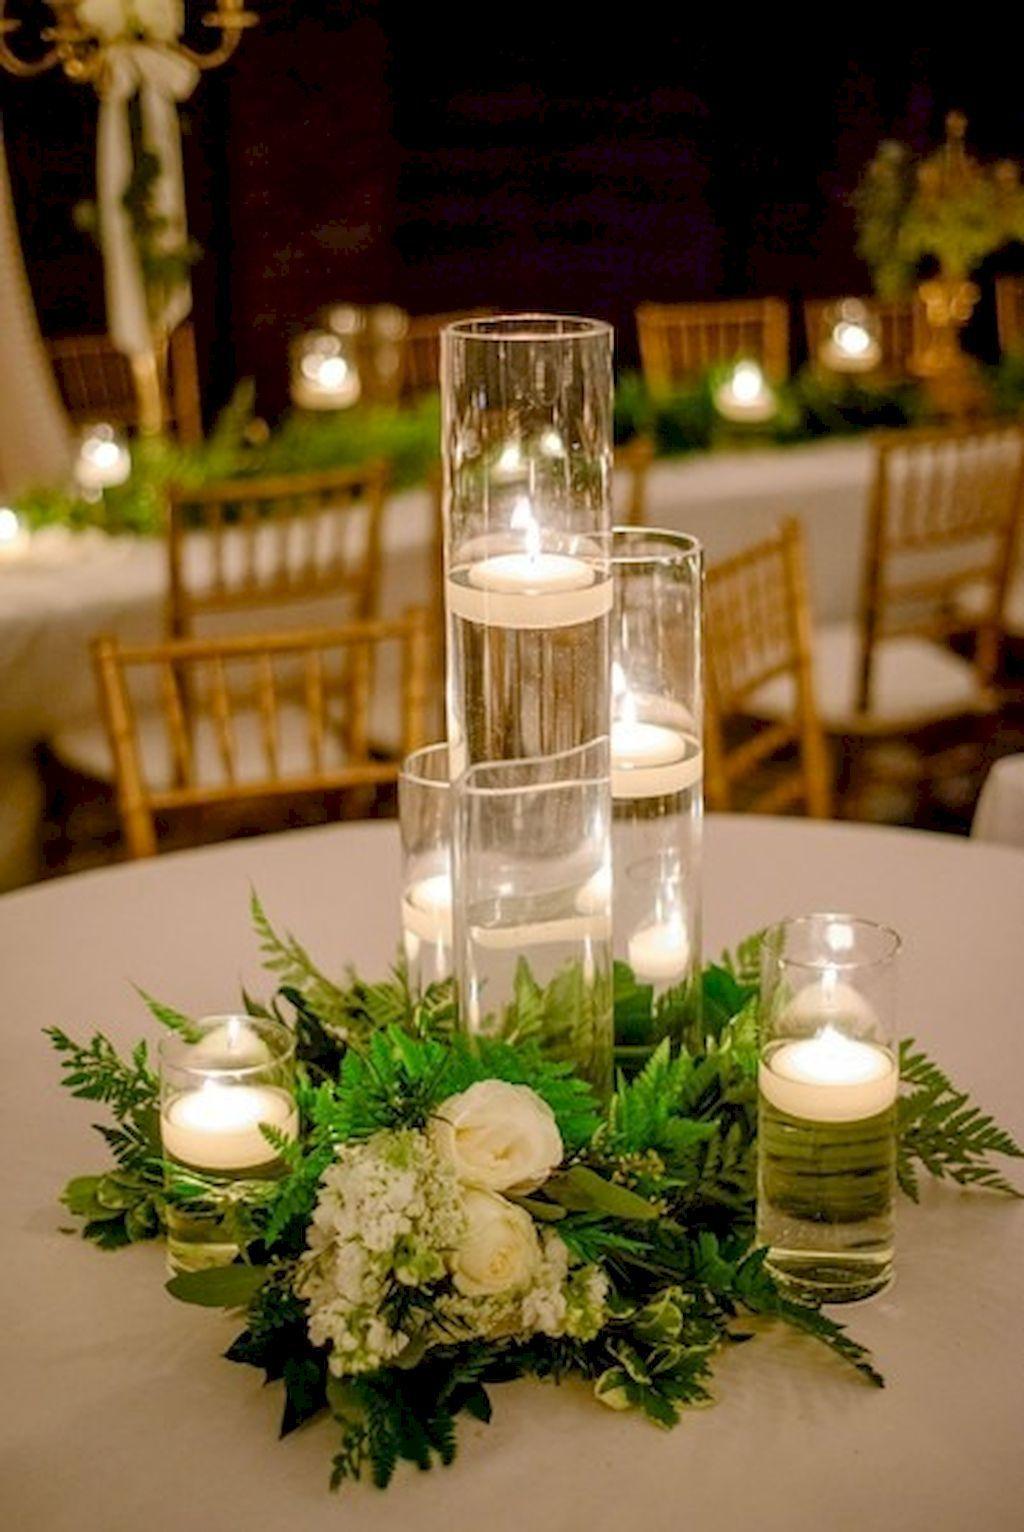 Wedding decor ideas 2018   Simple Greenery Wedding Centerpieces Decor Ideas  Wedding